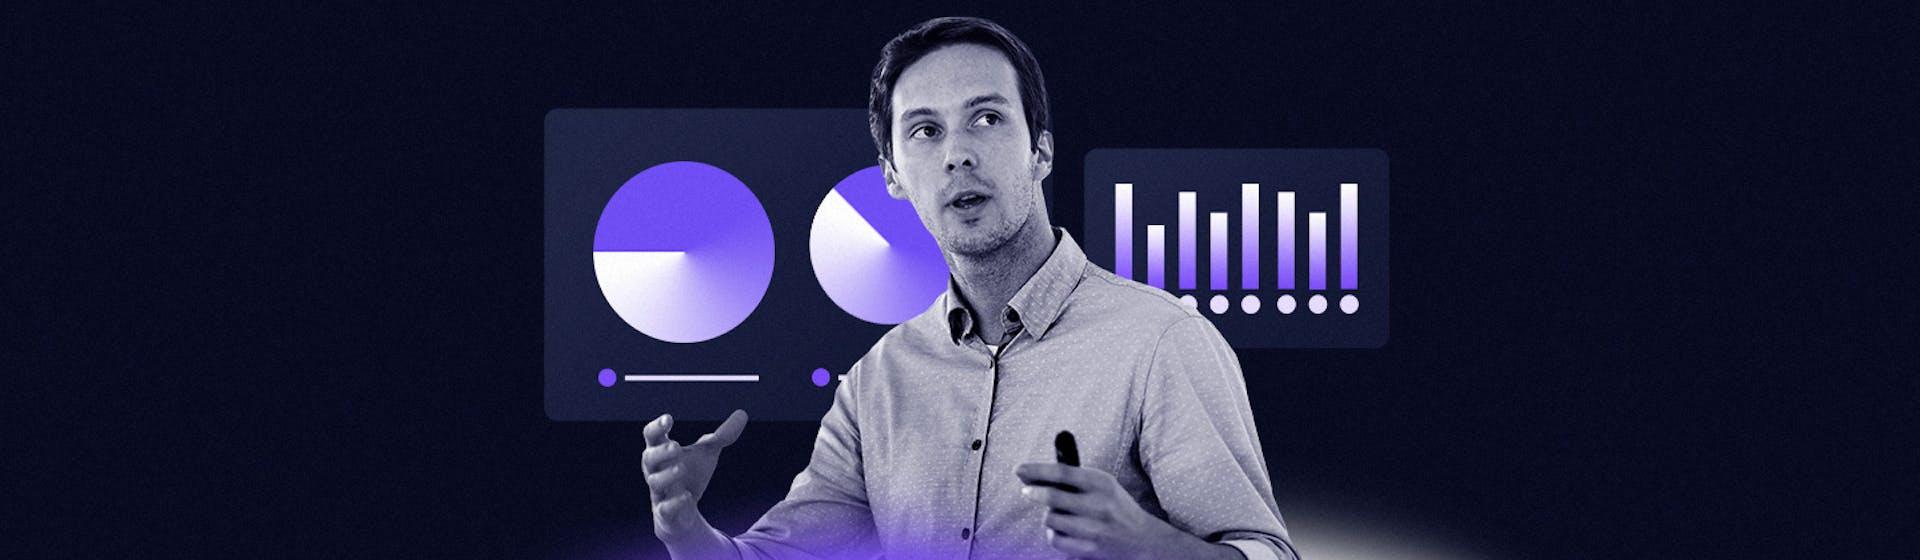 Descubre 10 tips para crear presentaciones ejecutivas impactantes